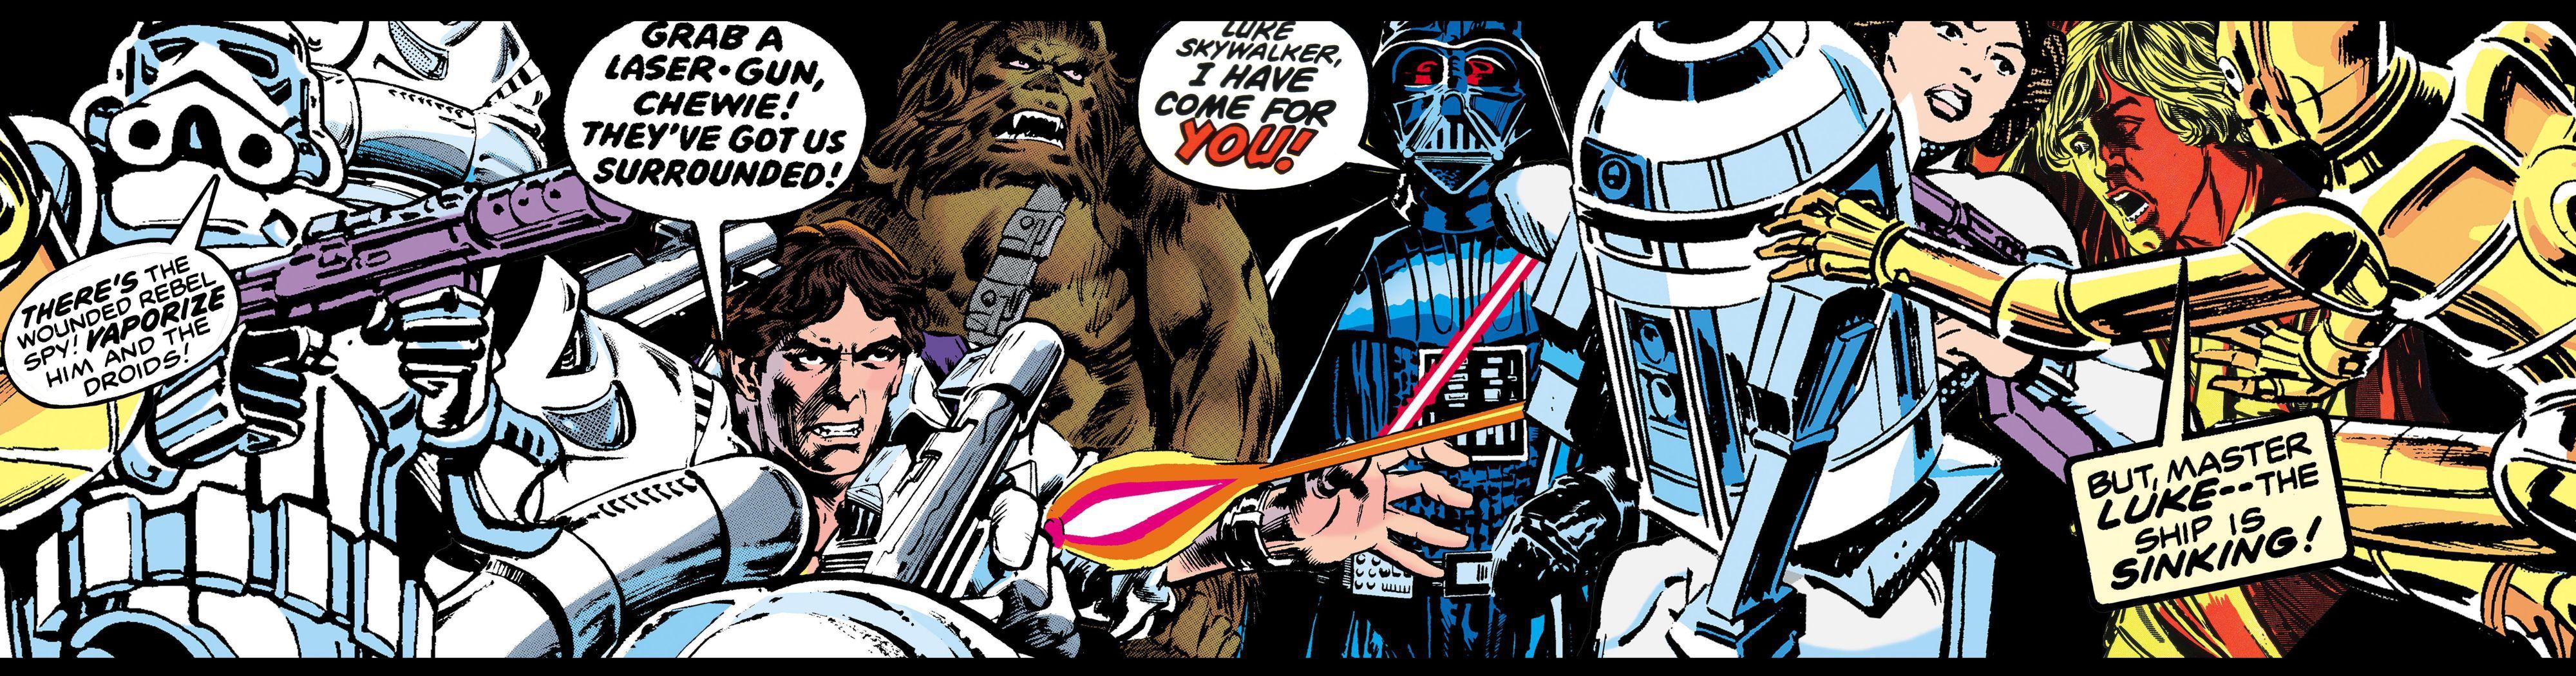 Star Wars Multicolour Comic Border Departments Diy At B Amp Q